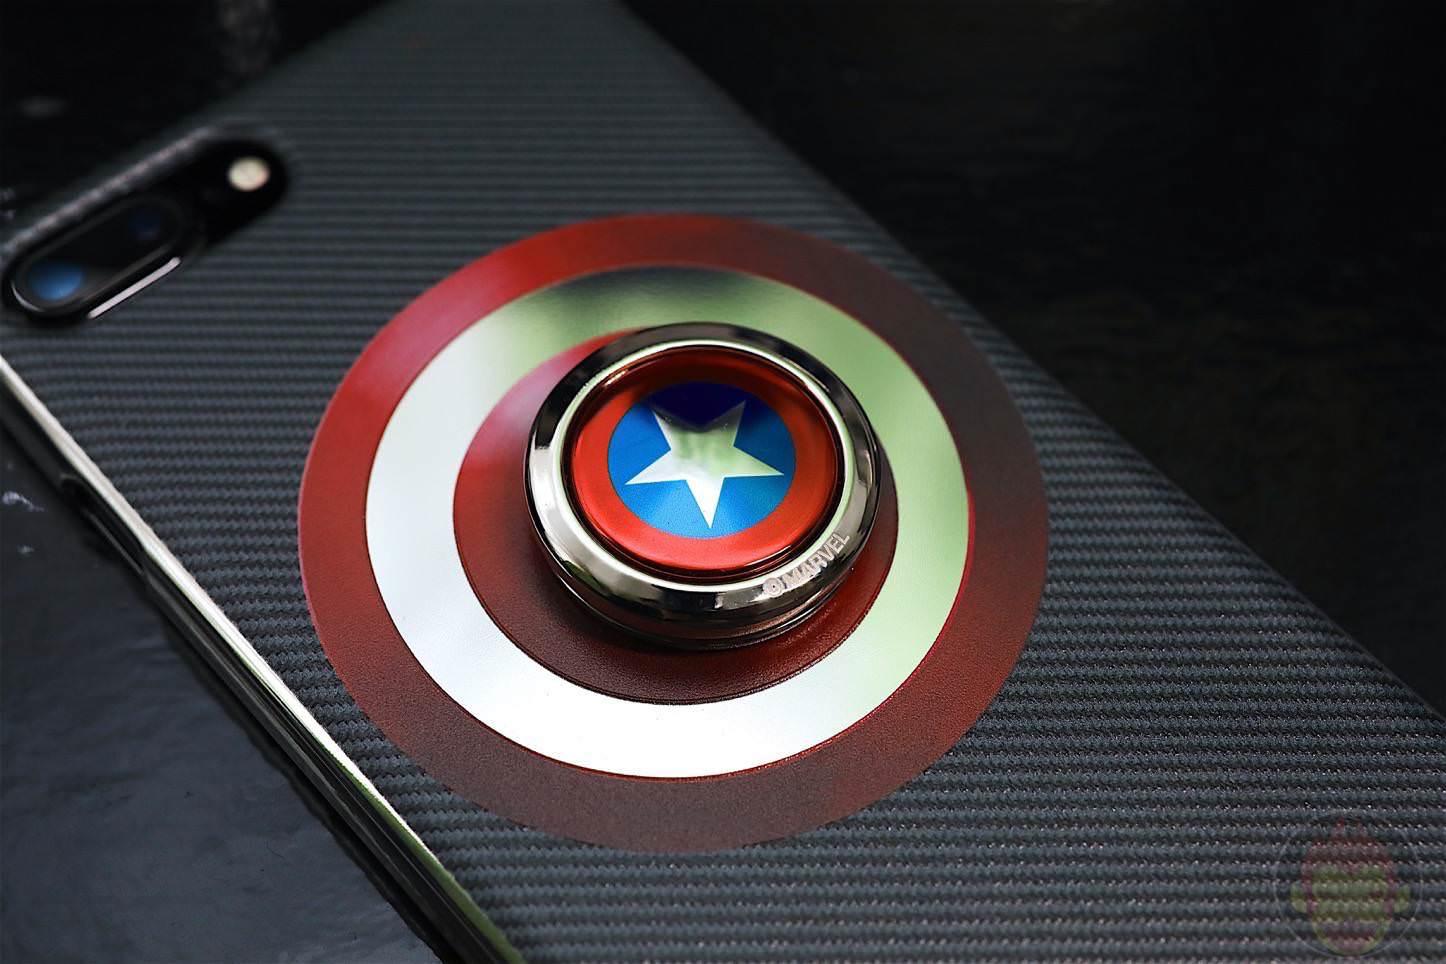 MARVEL-Design-iPhone-7-Plus-Case-and-Ring-06.jpg